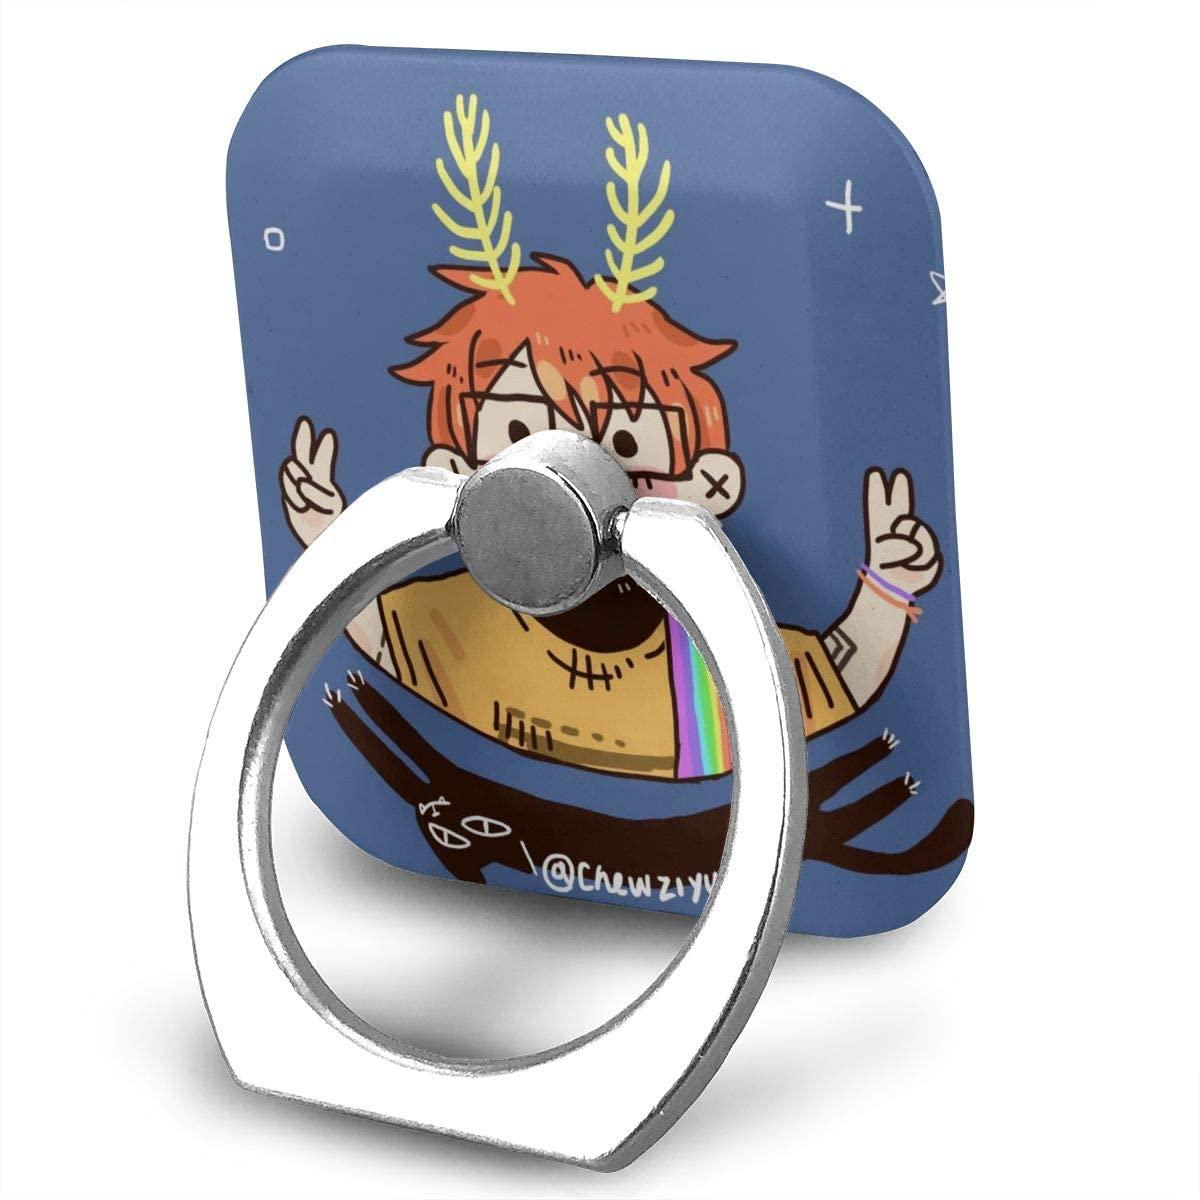 Cavetown Phone Finger Ring Stand Bracket Holder Smartphone Grip Stand Holder 360 Degree Rotating Sticky Cute